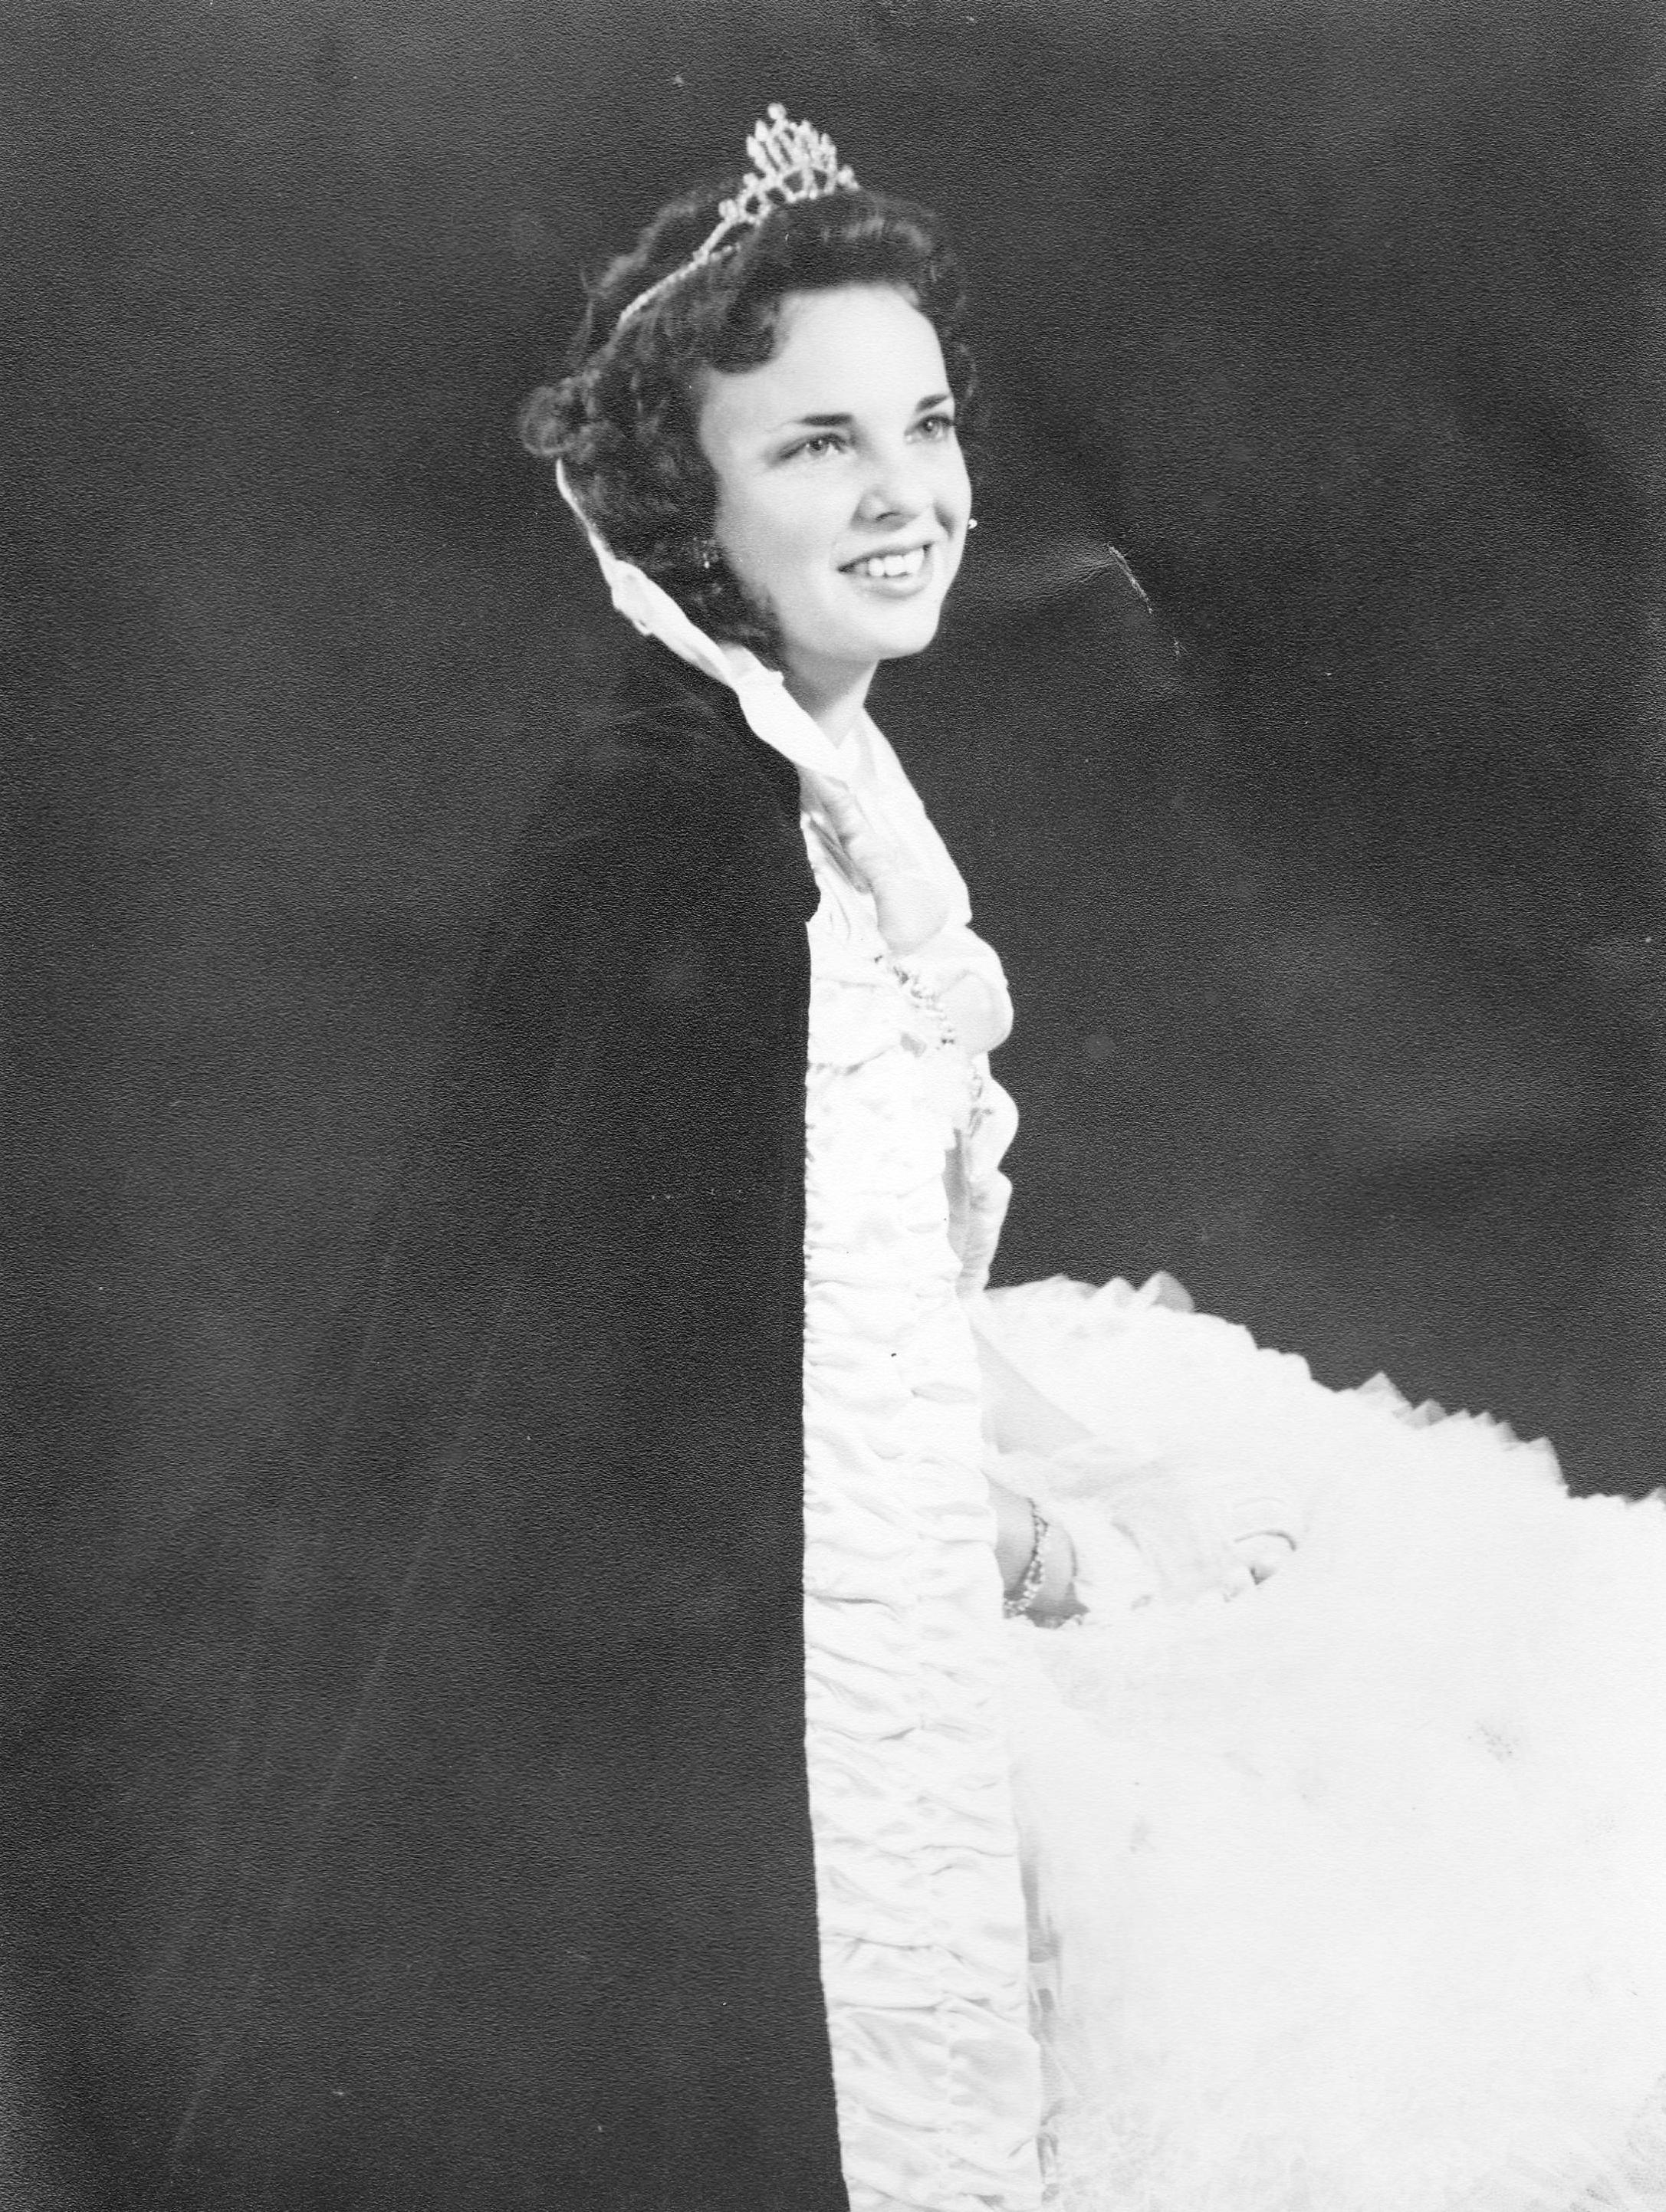 Trudy Herrin Totten - Miss Buna 1960